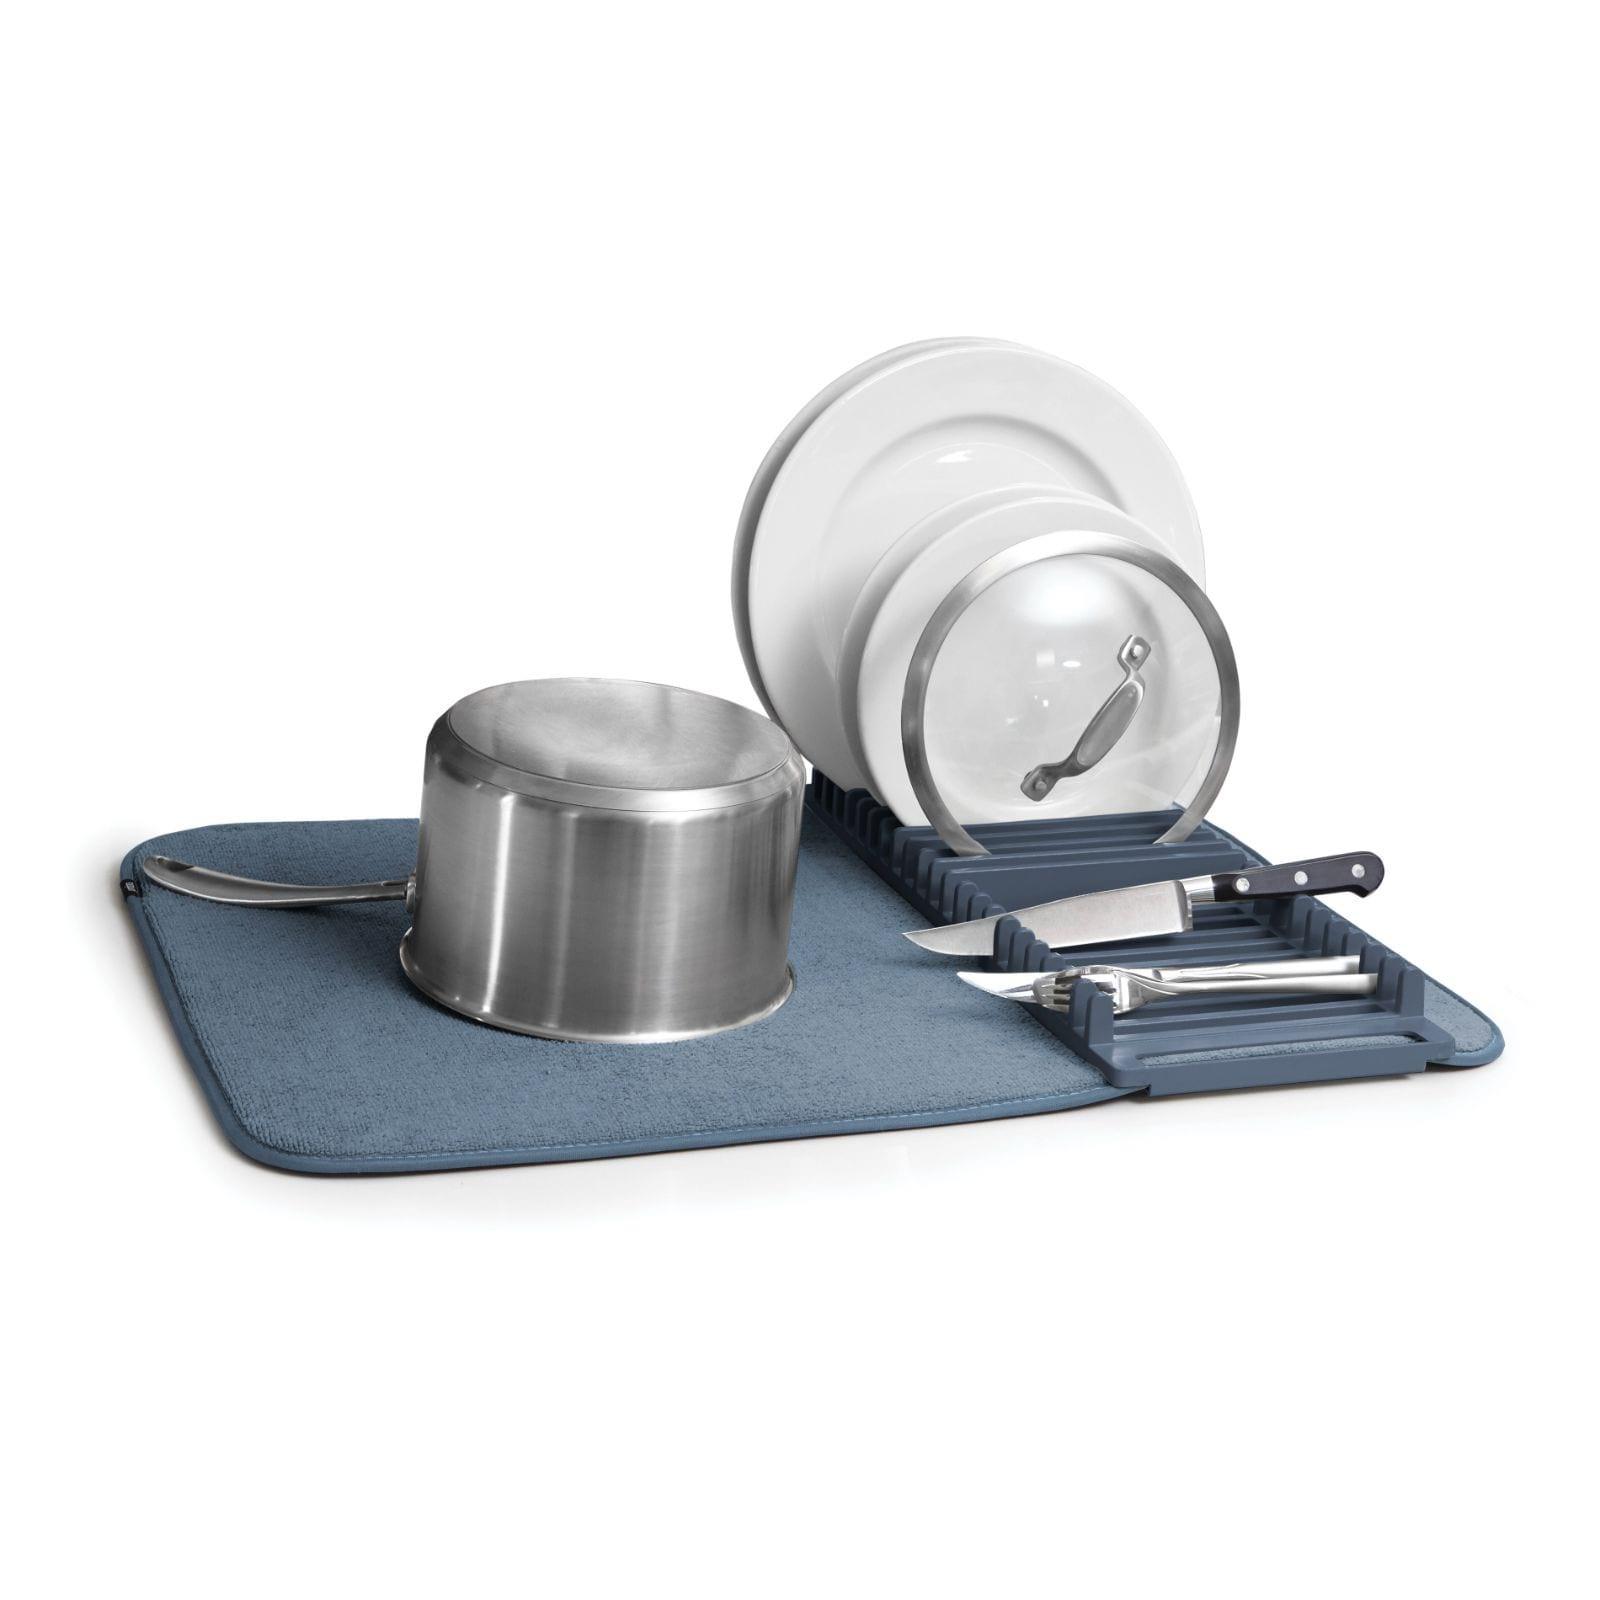 Udry Foldable Drying Mat (Denim) - Umbra